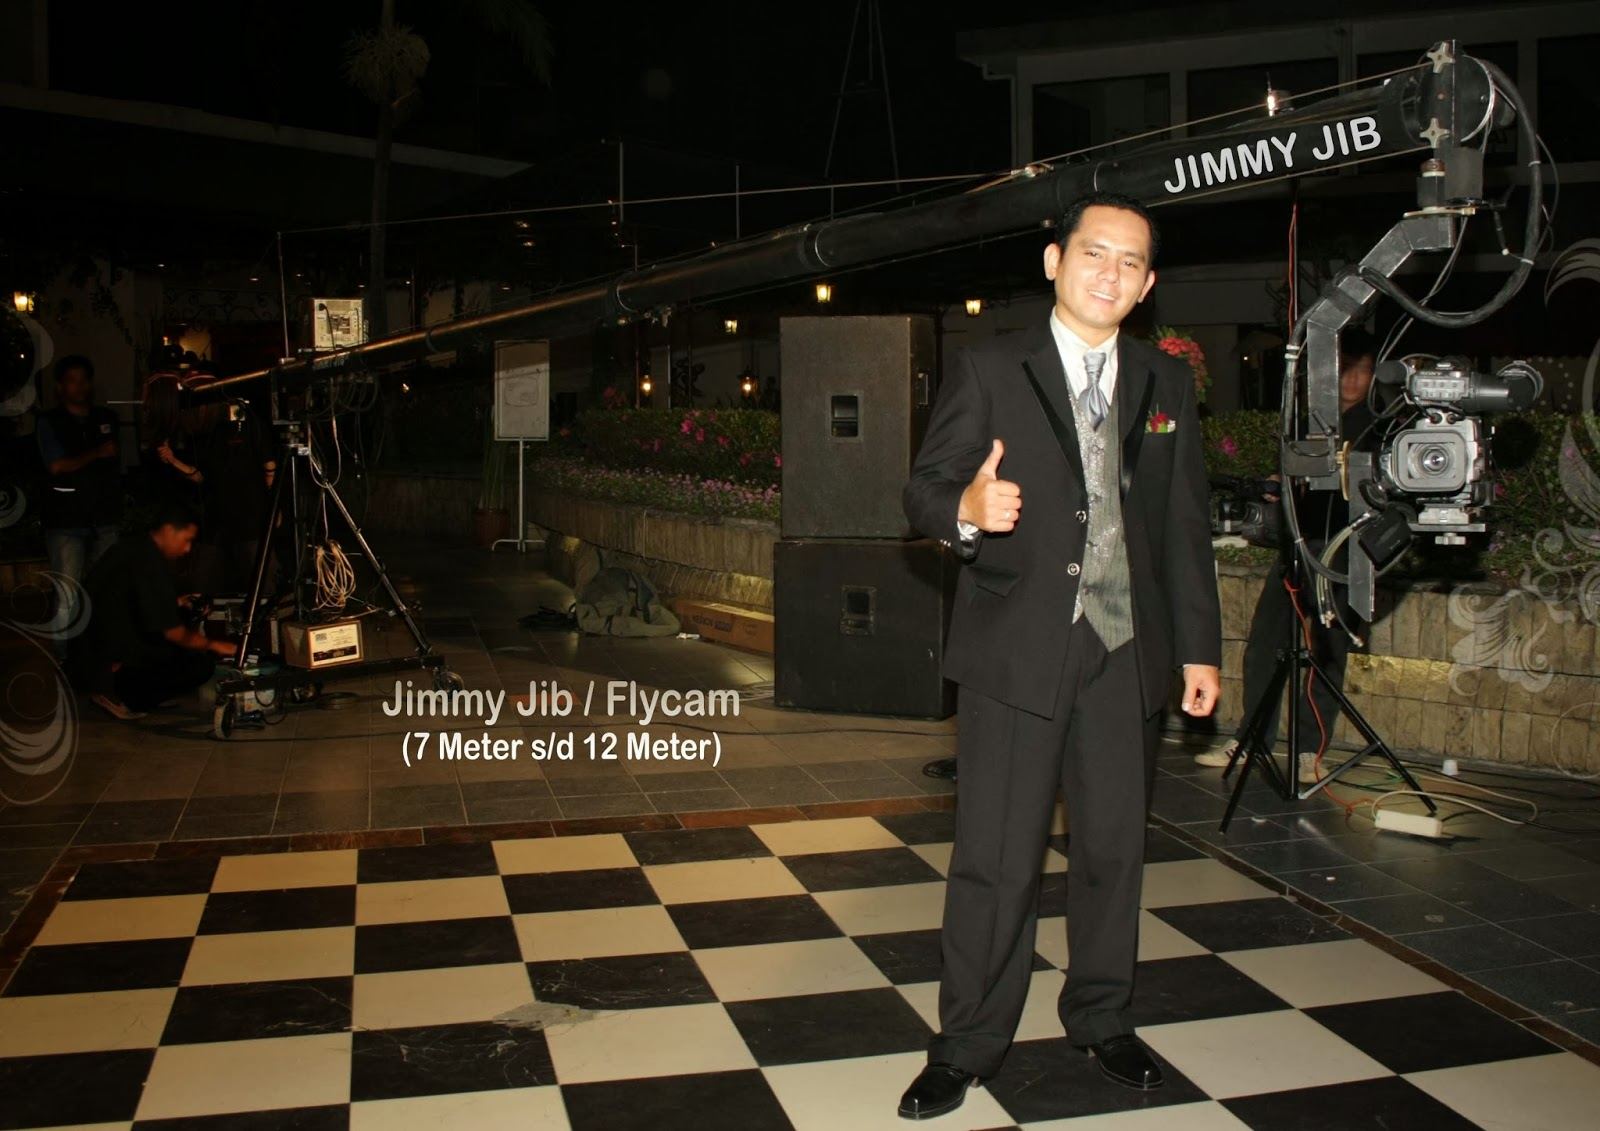 JCAN CREATIVE STUDIO Videography - Photography - Entertainment